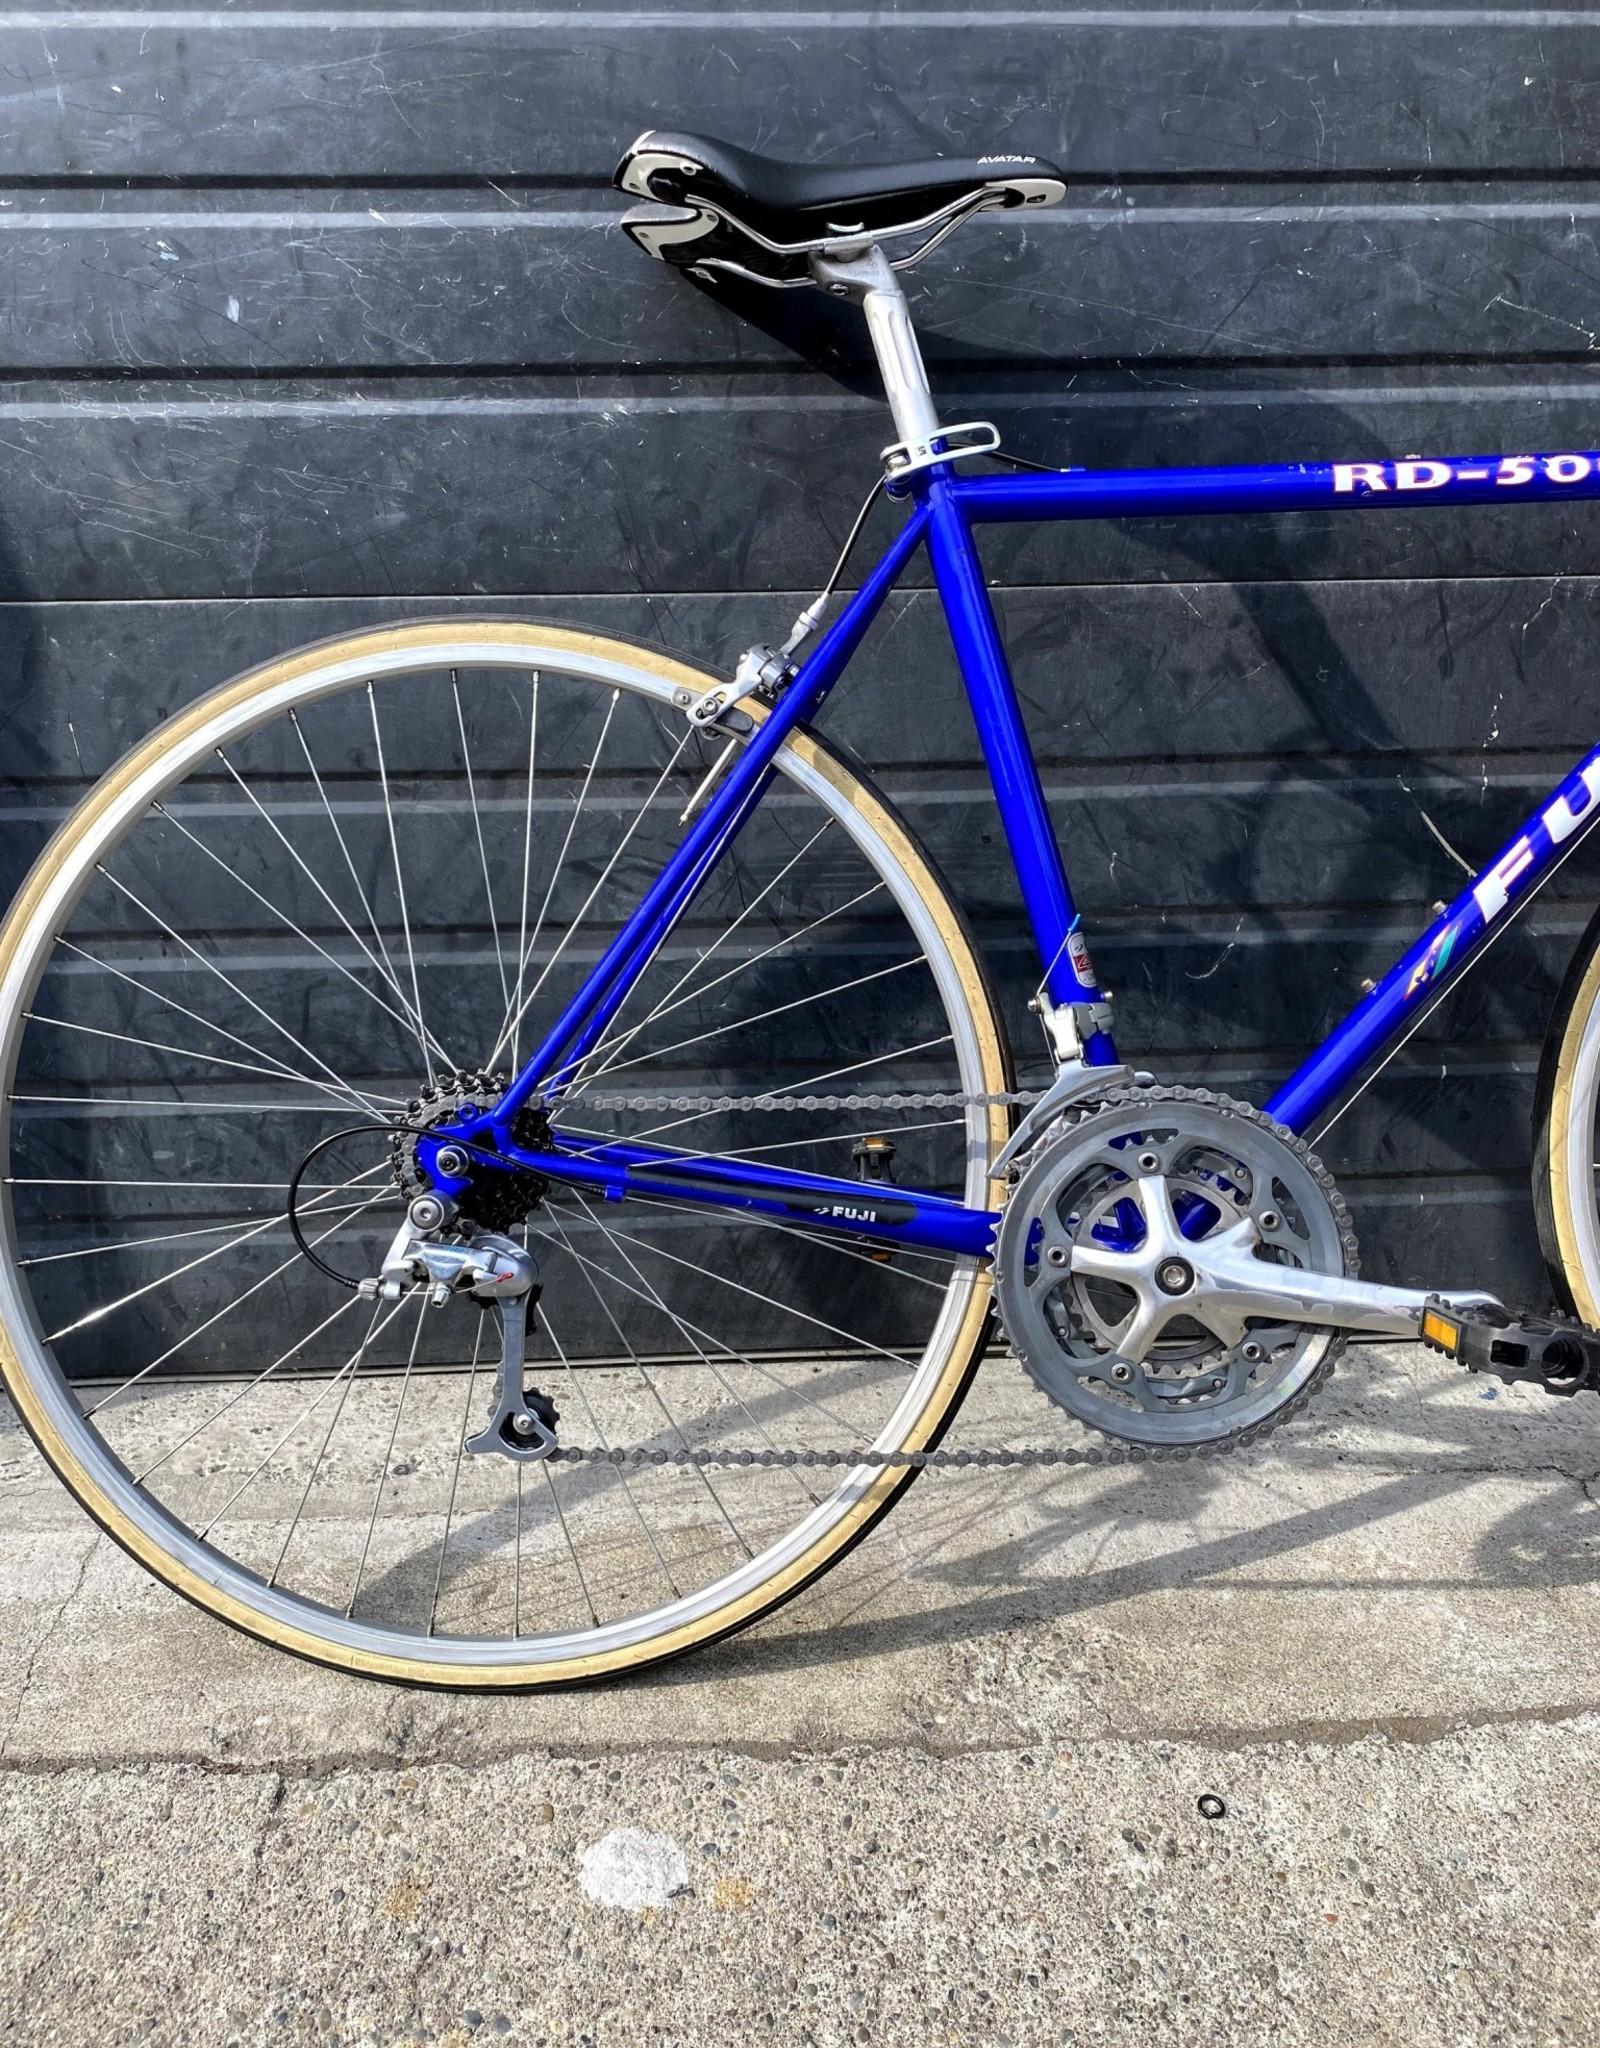 Fuji 52cm Fuji RD-500